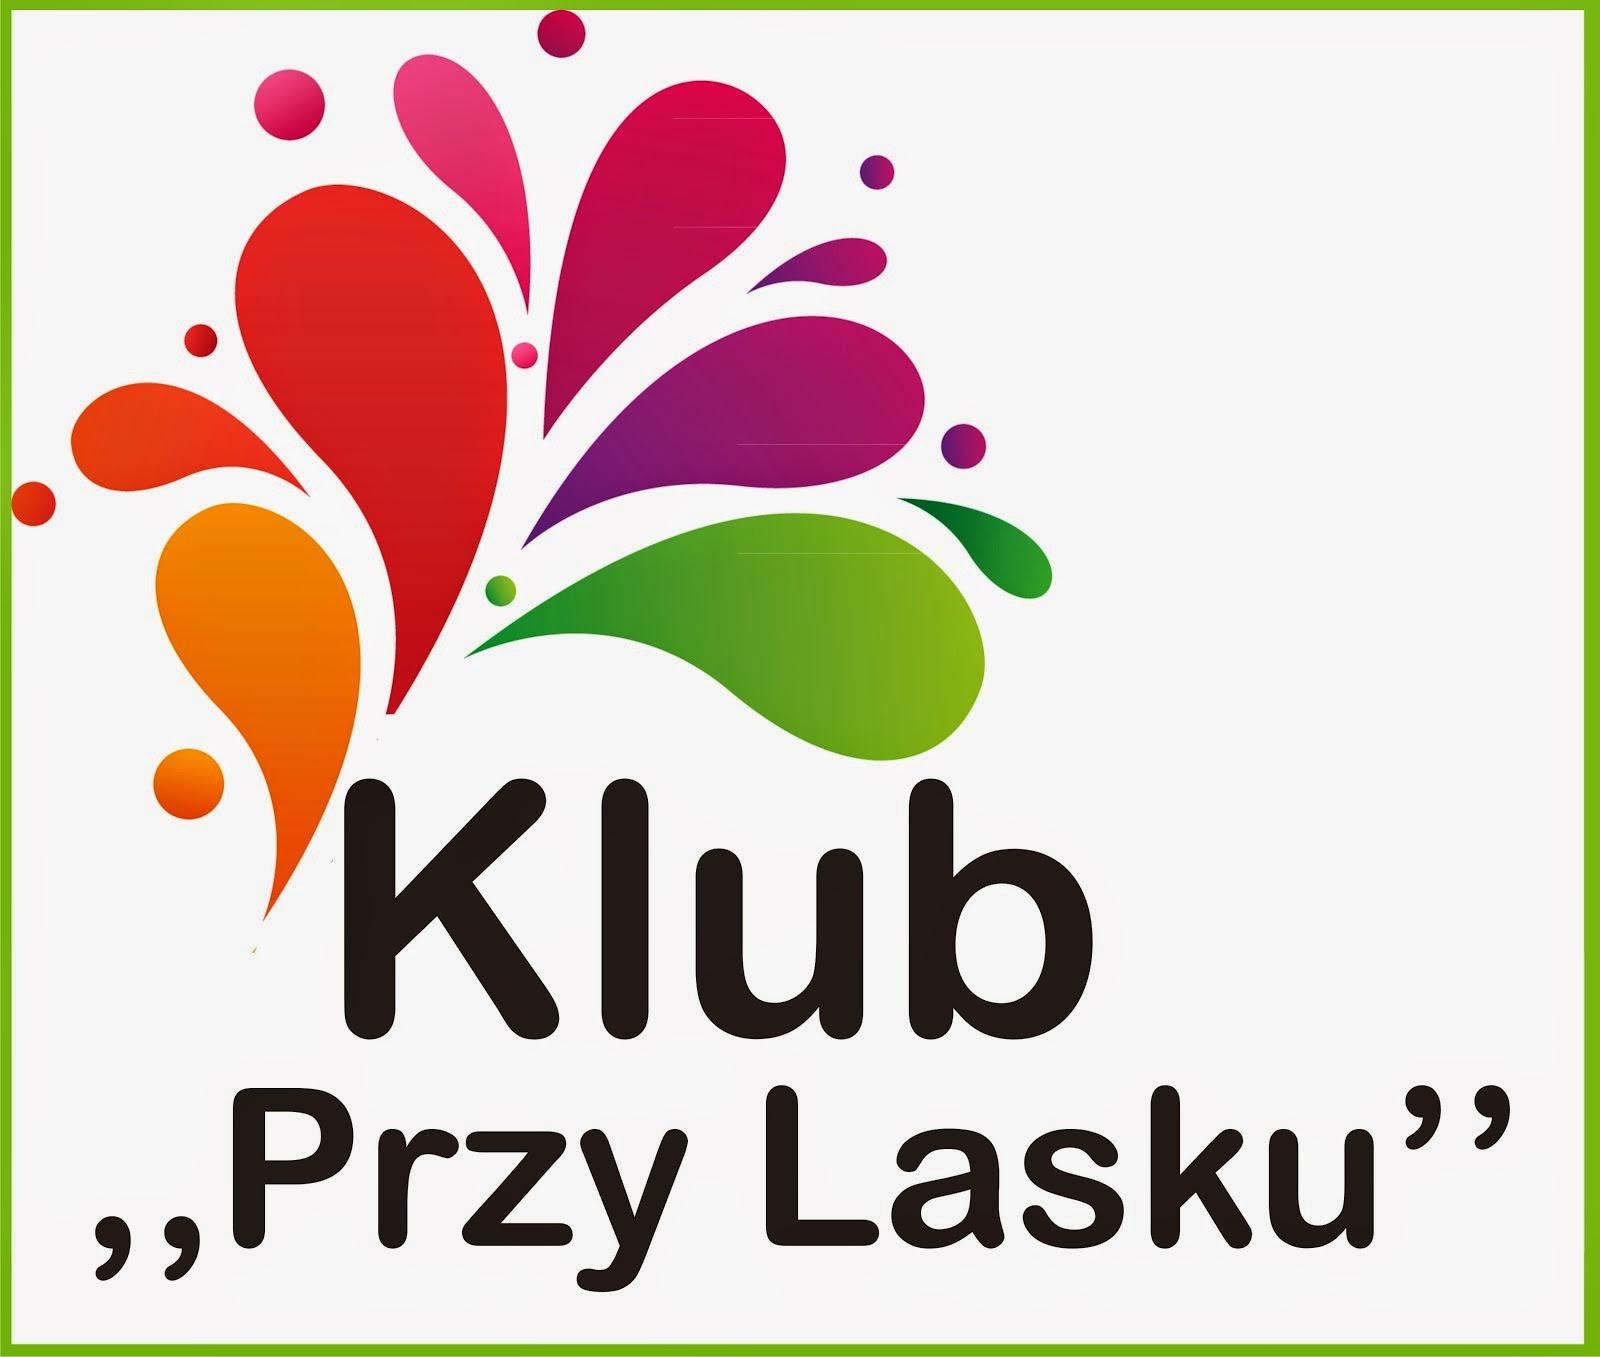 e-mail: justna.bazylewicz@gmail.com